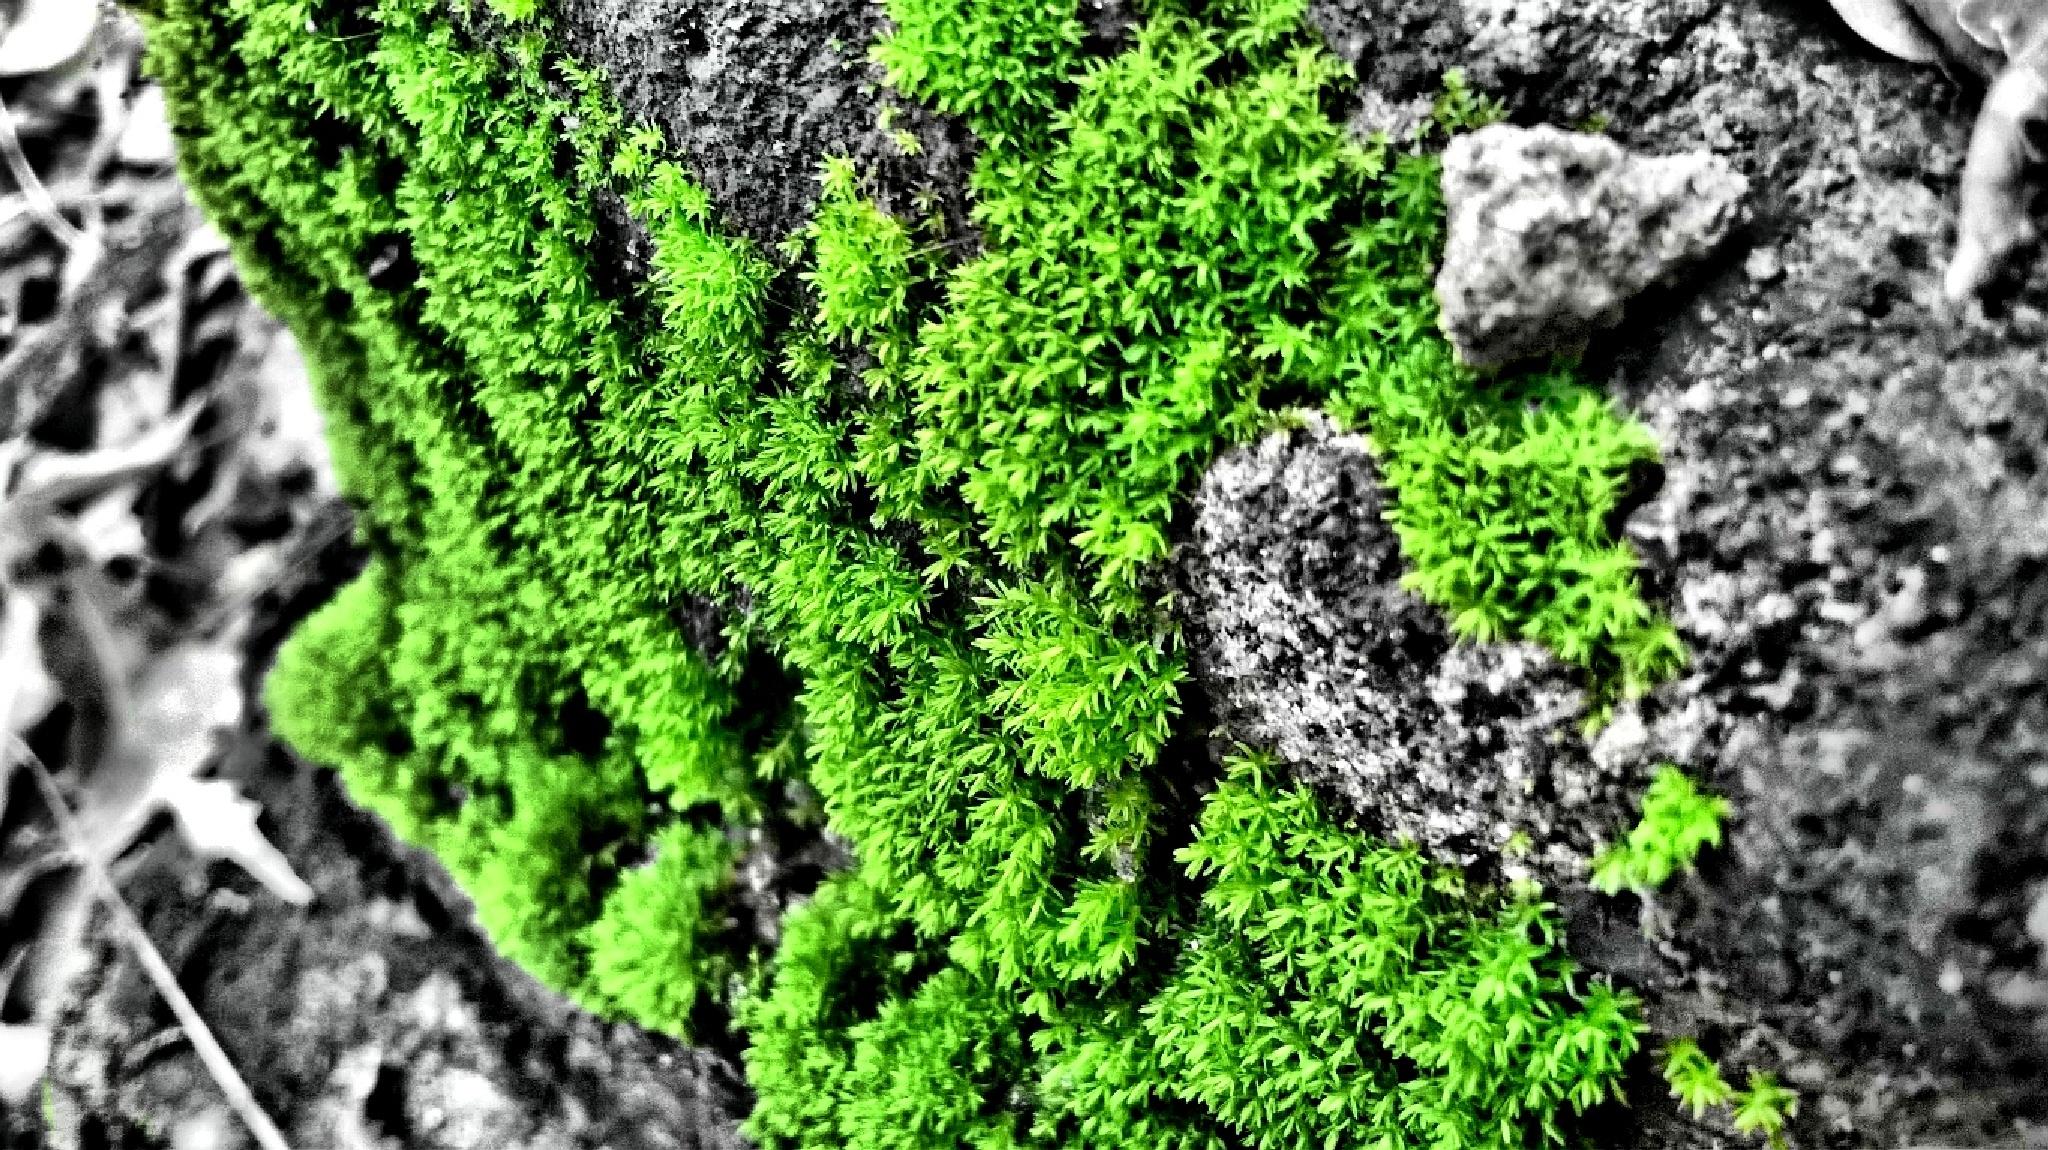 Green Algae by Shahul Rahman